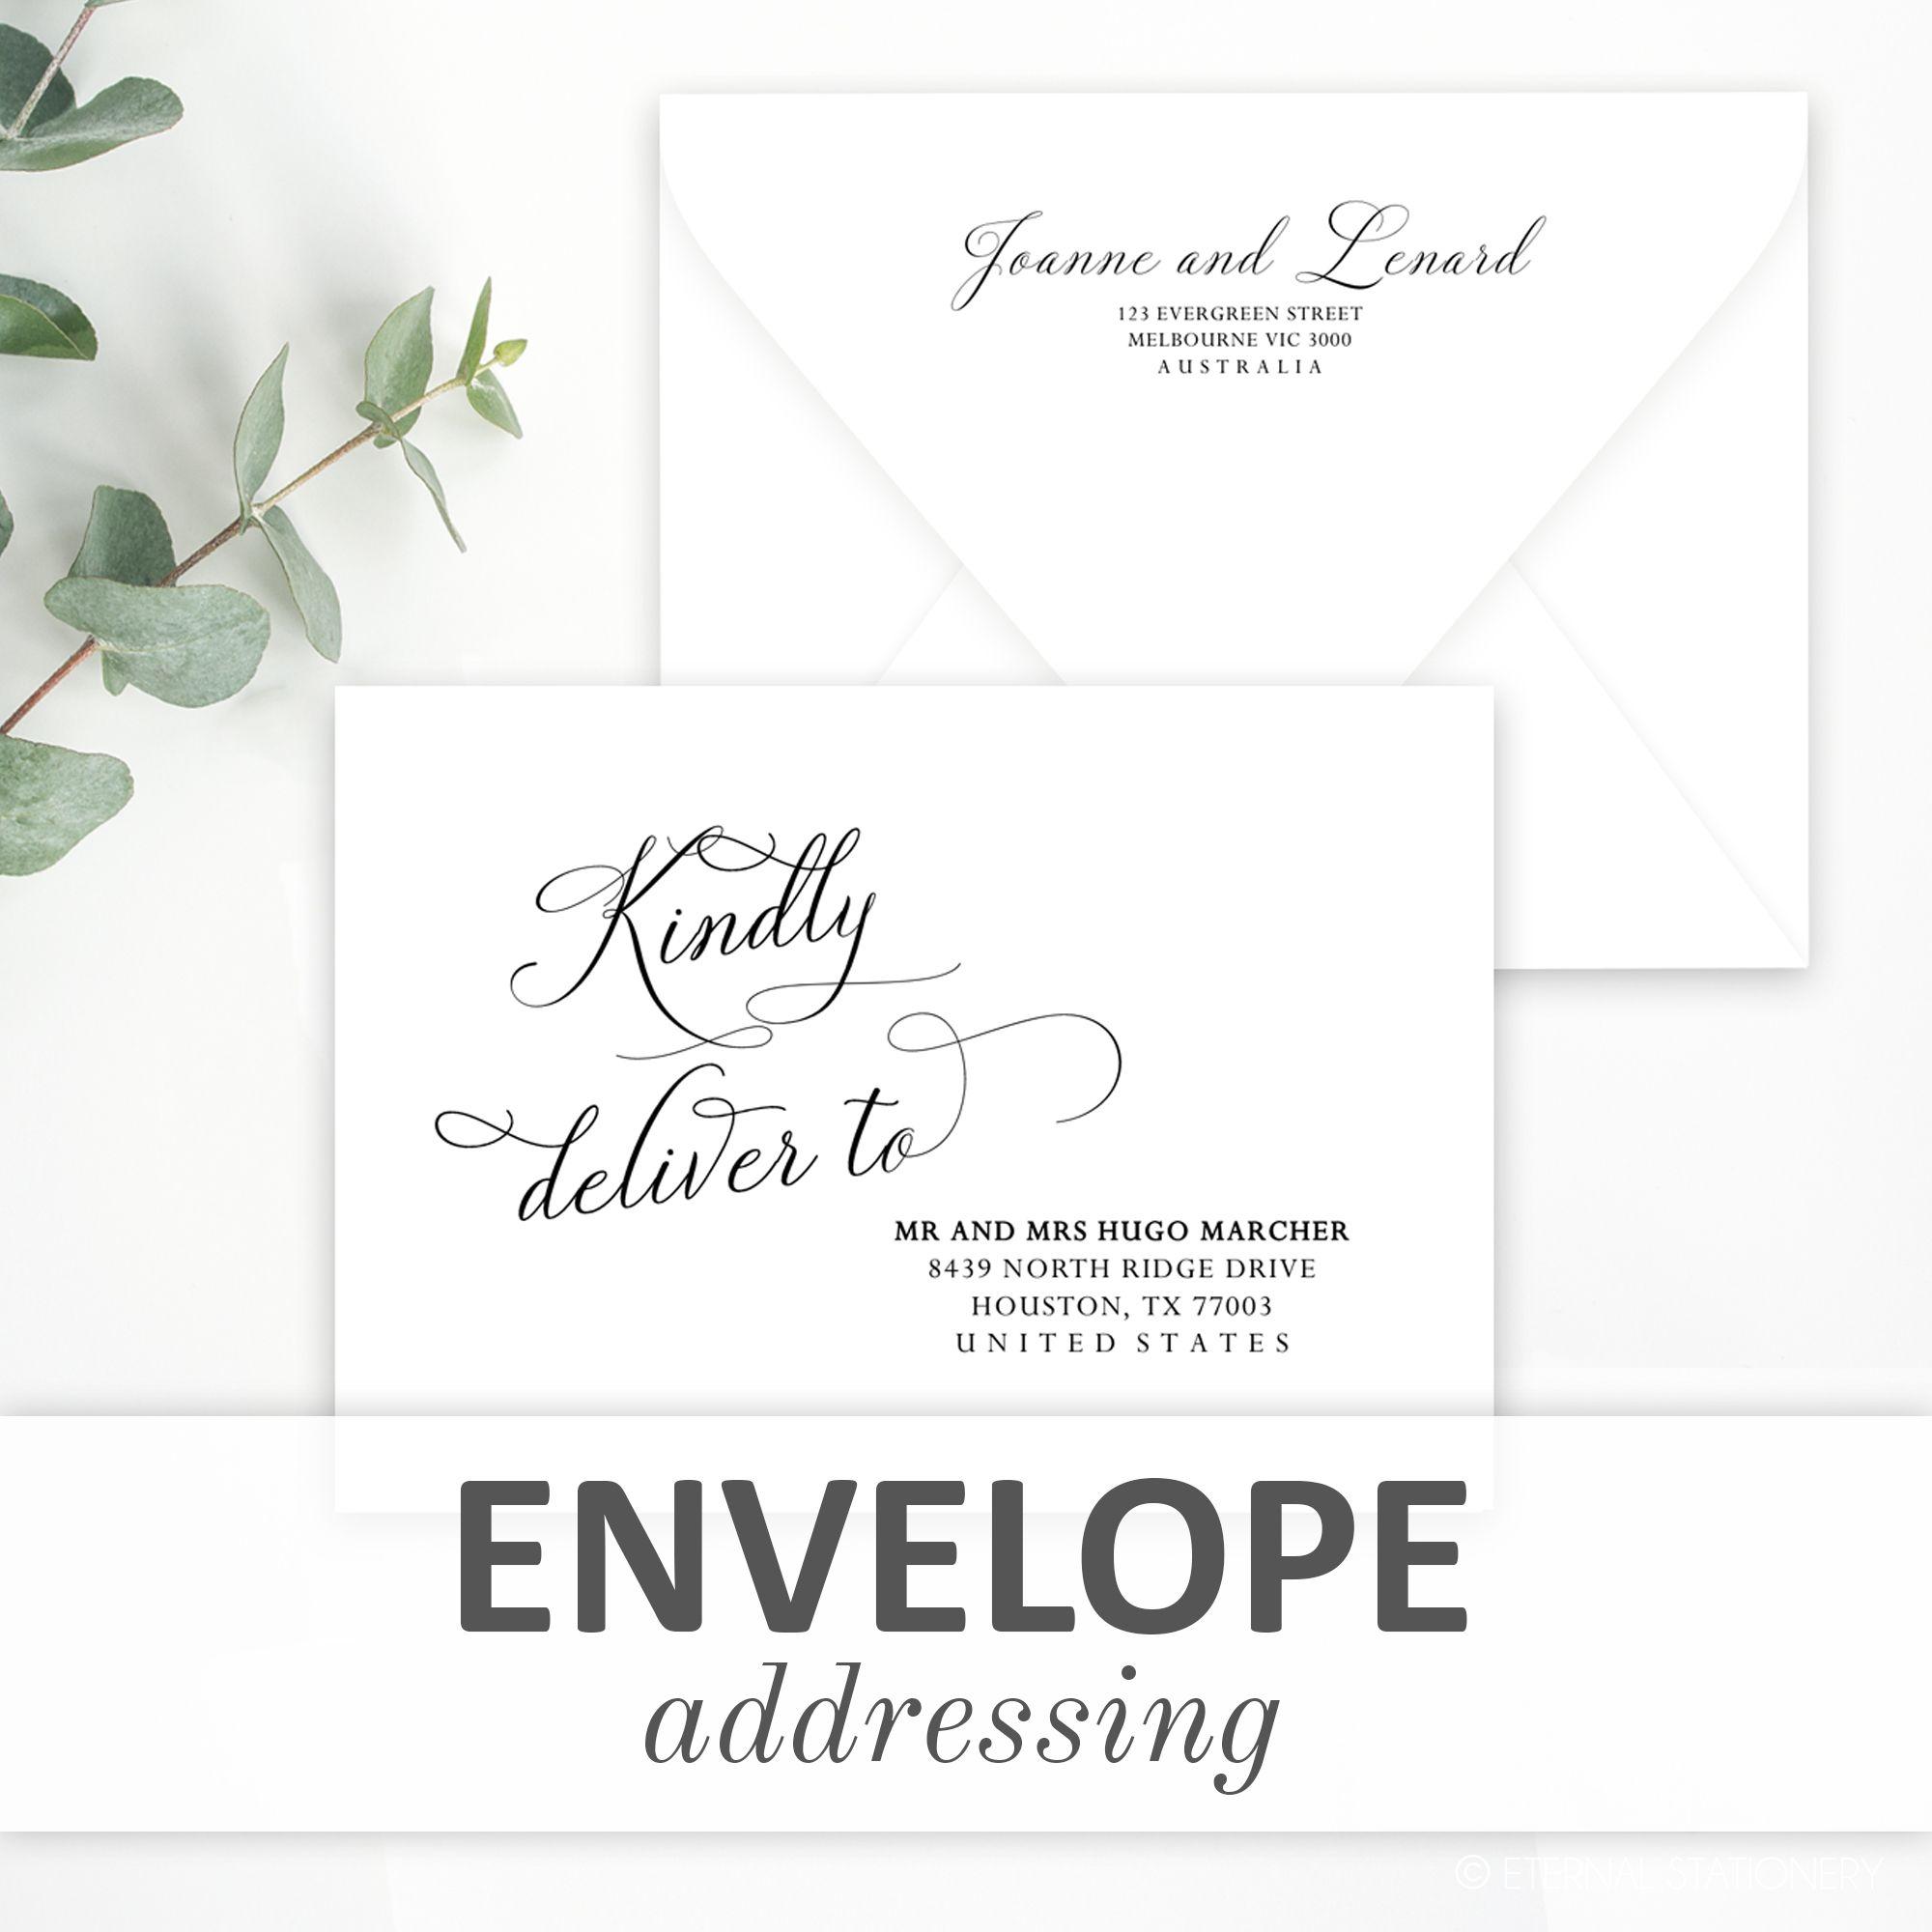 Envelope Addressing Templates in 2020 Envelope